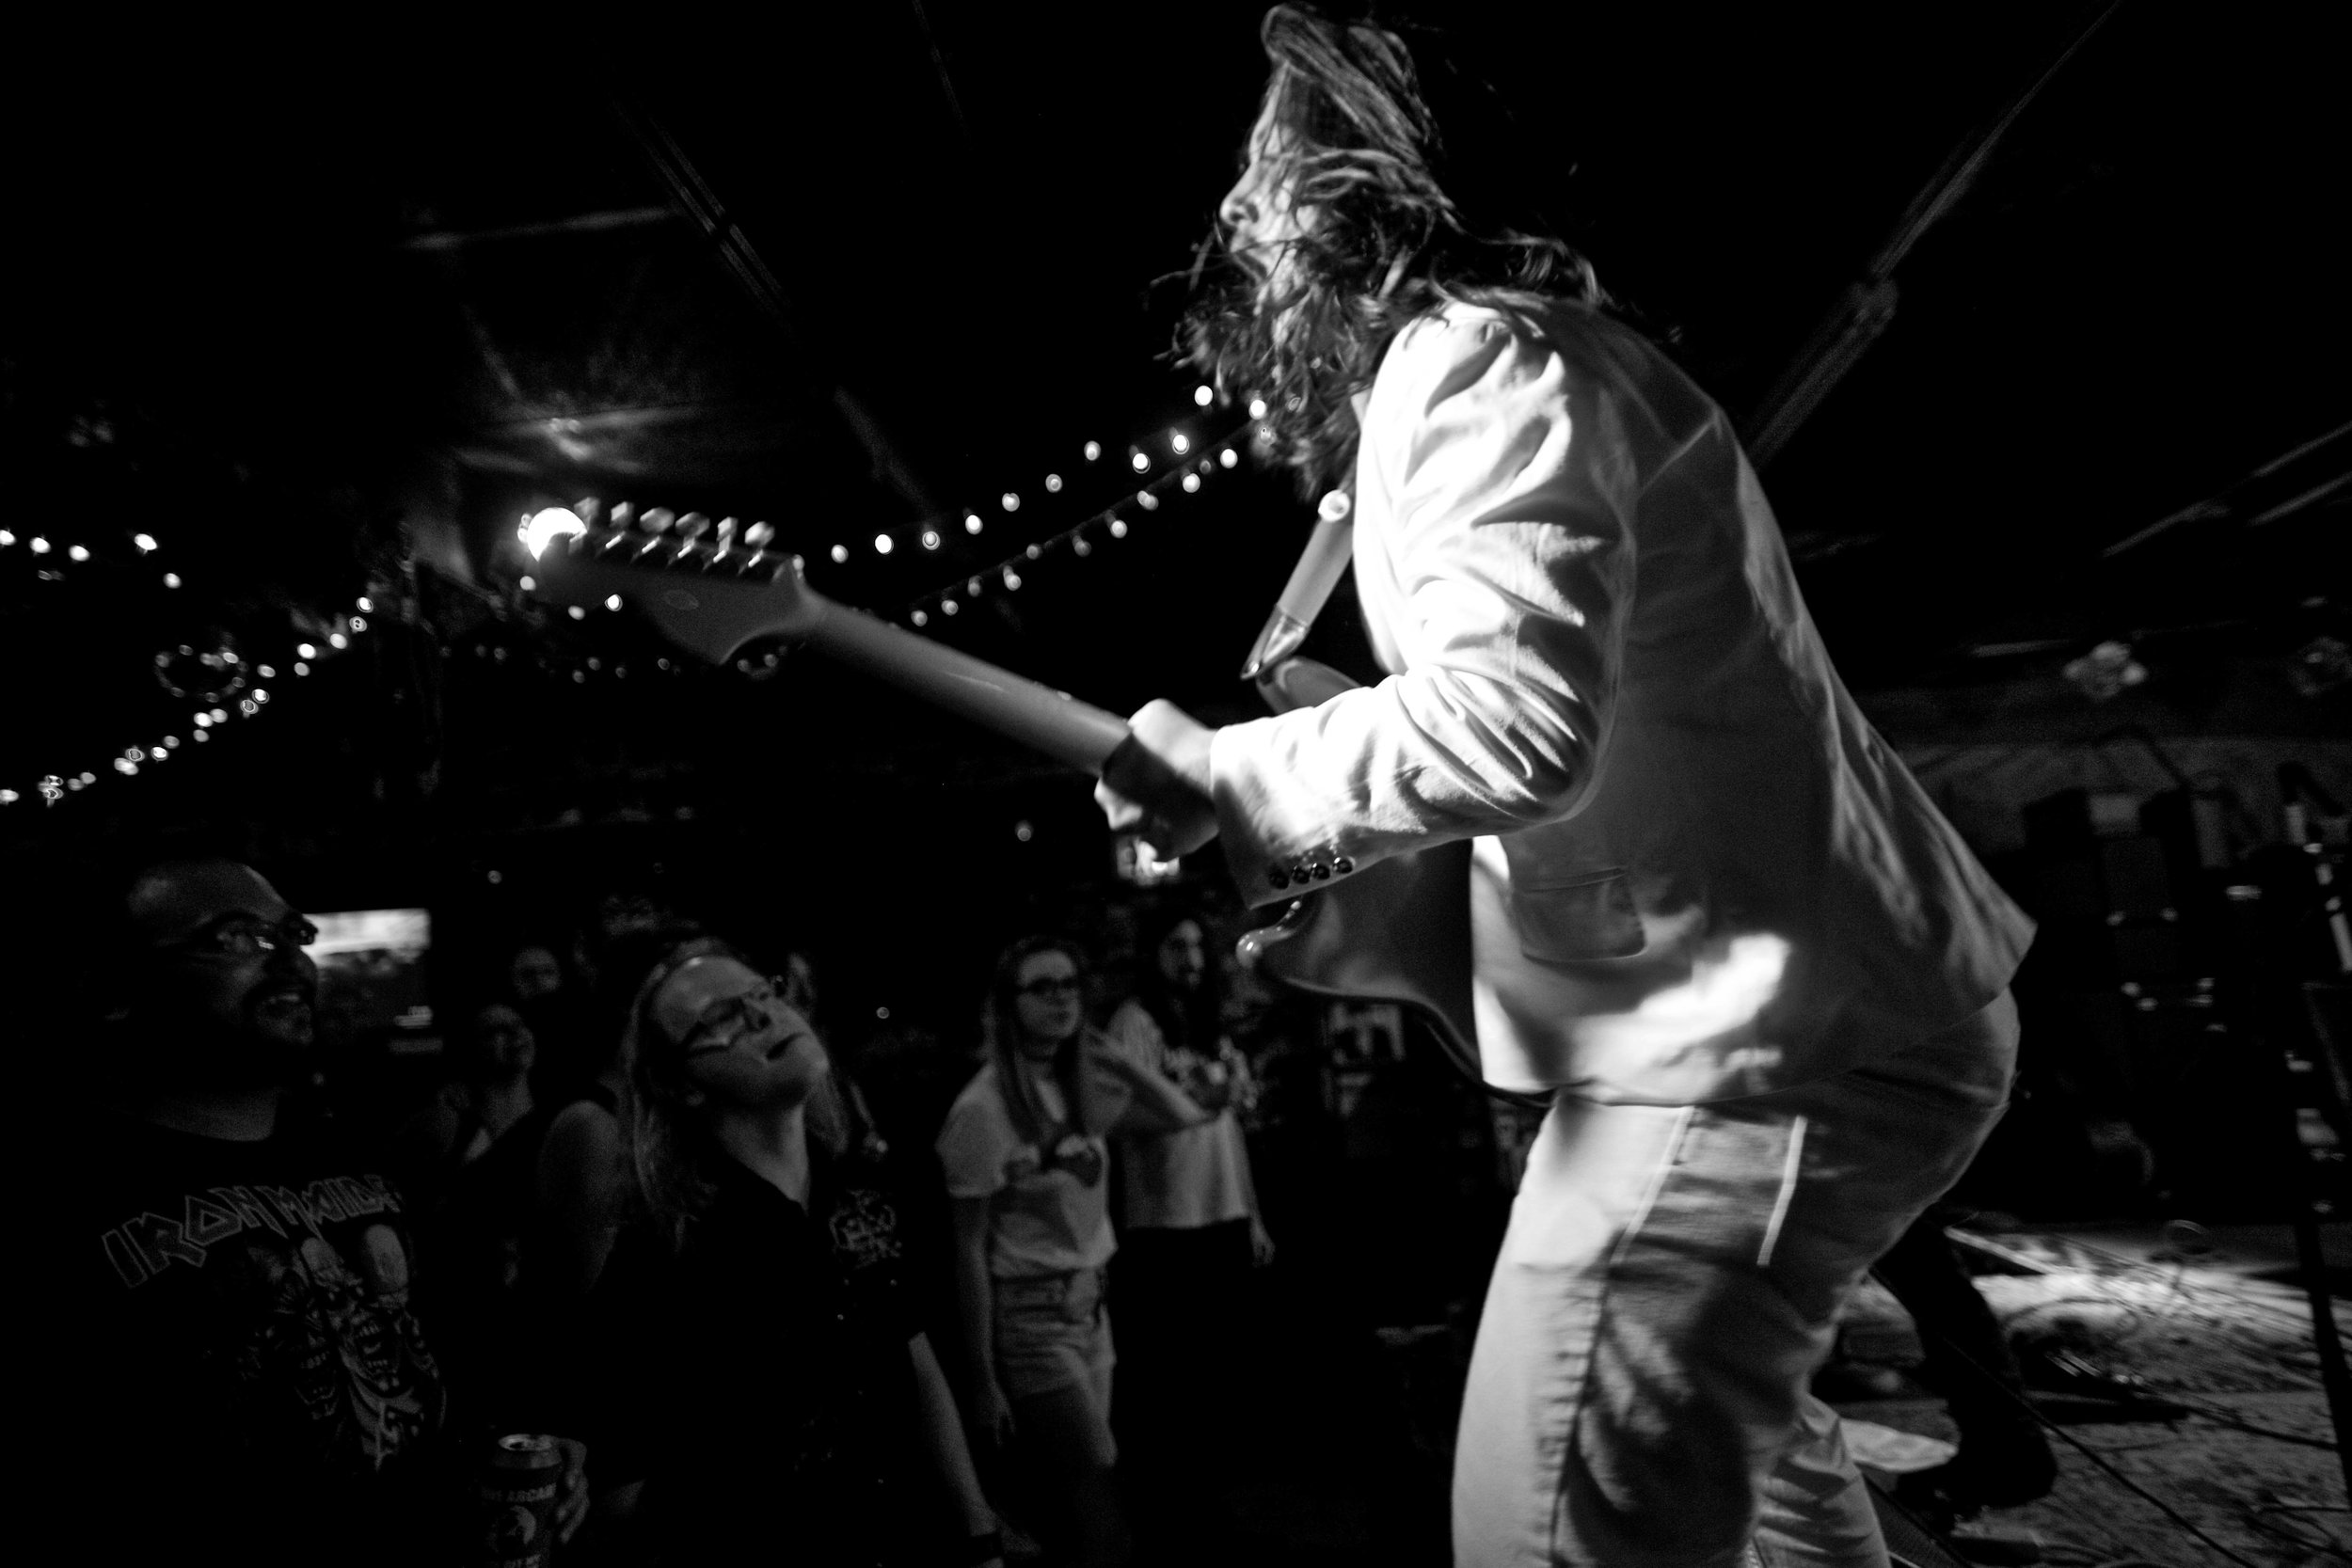 King Magnum. The Nick. Birmingham, AL. 2016.